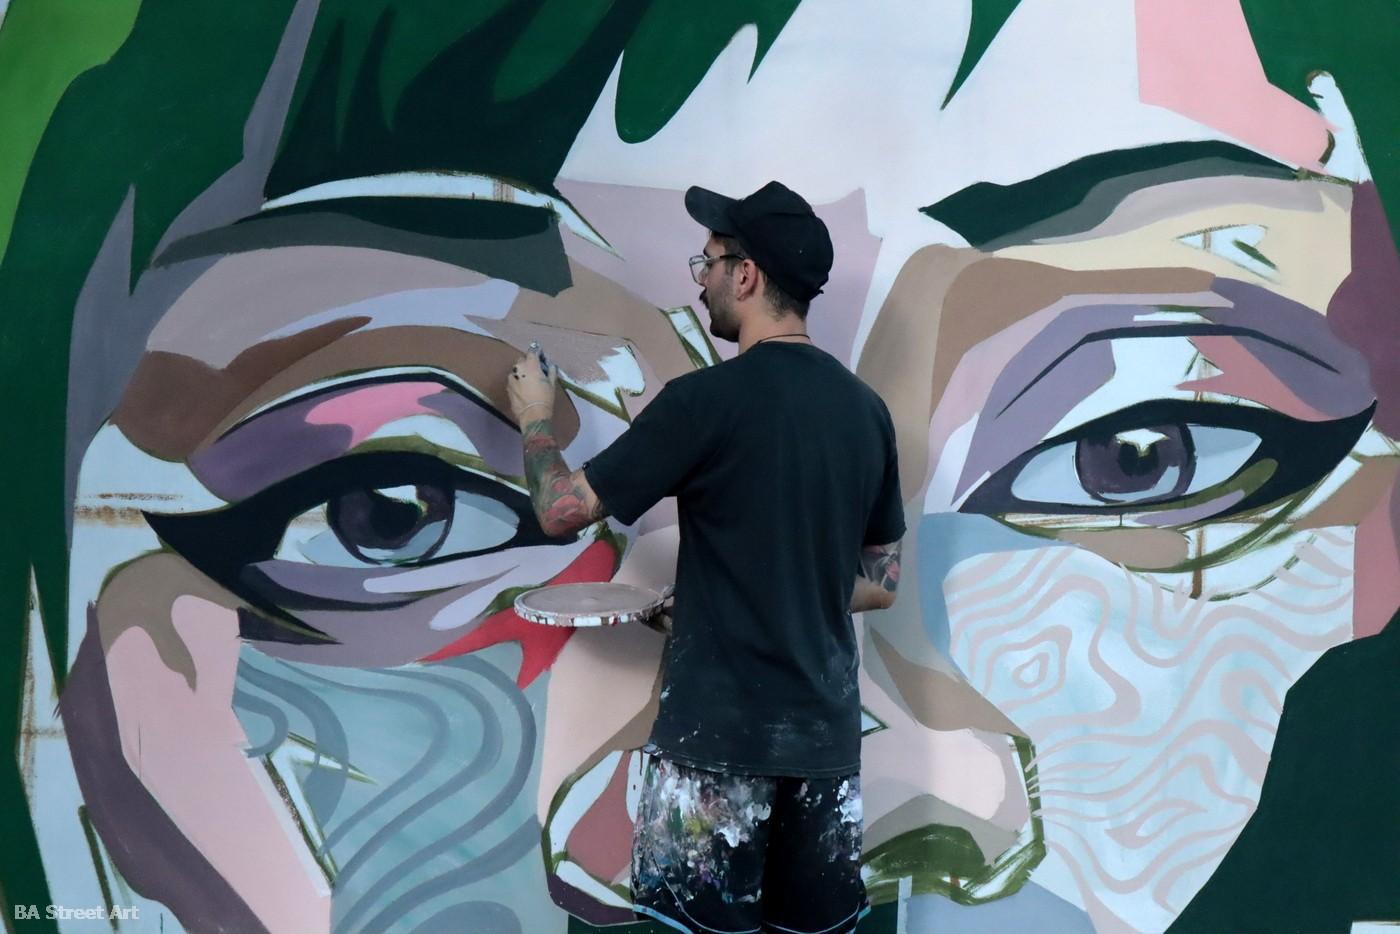 patxi mazzoni alonso mural mujer arte callejero buenos aires argentina